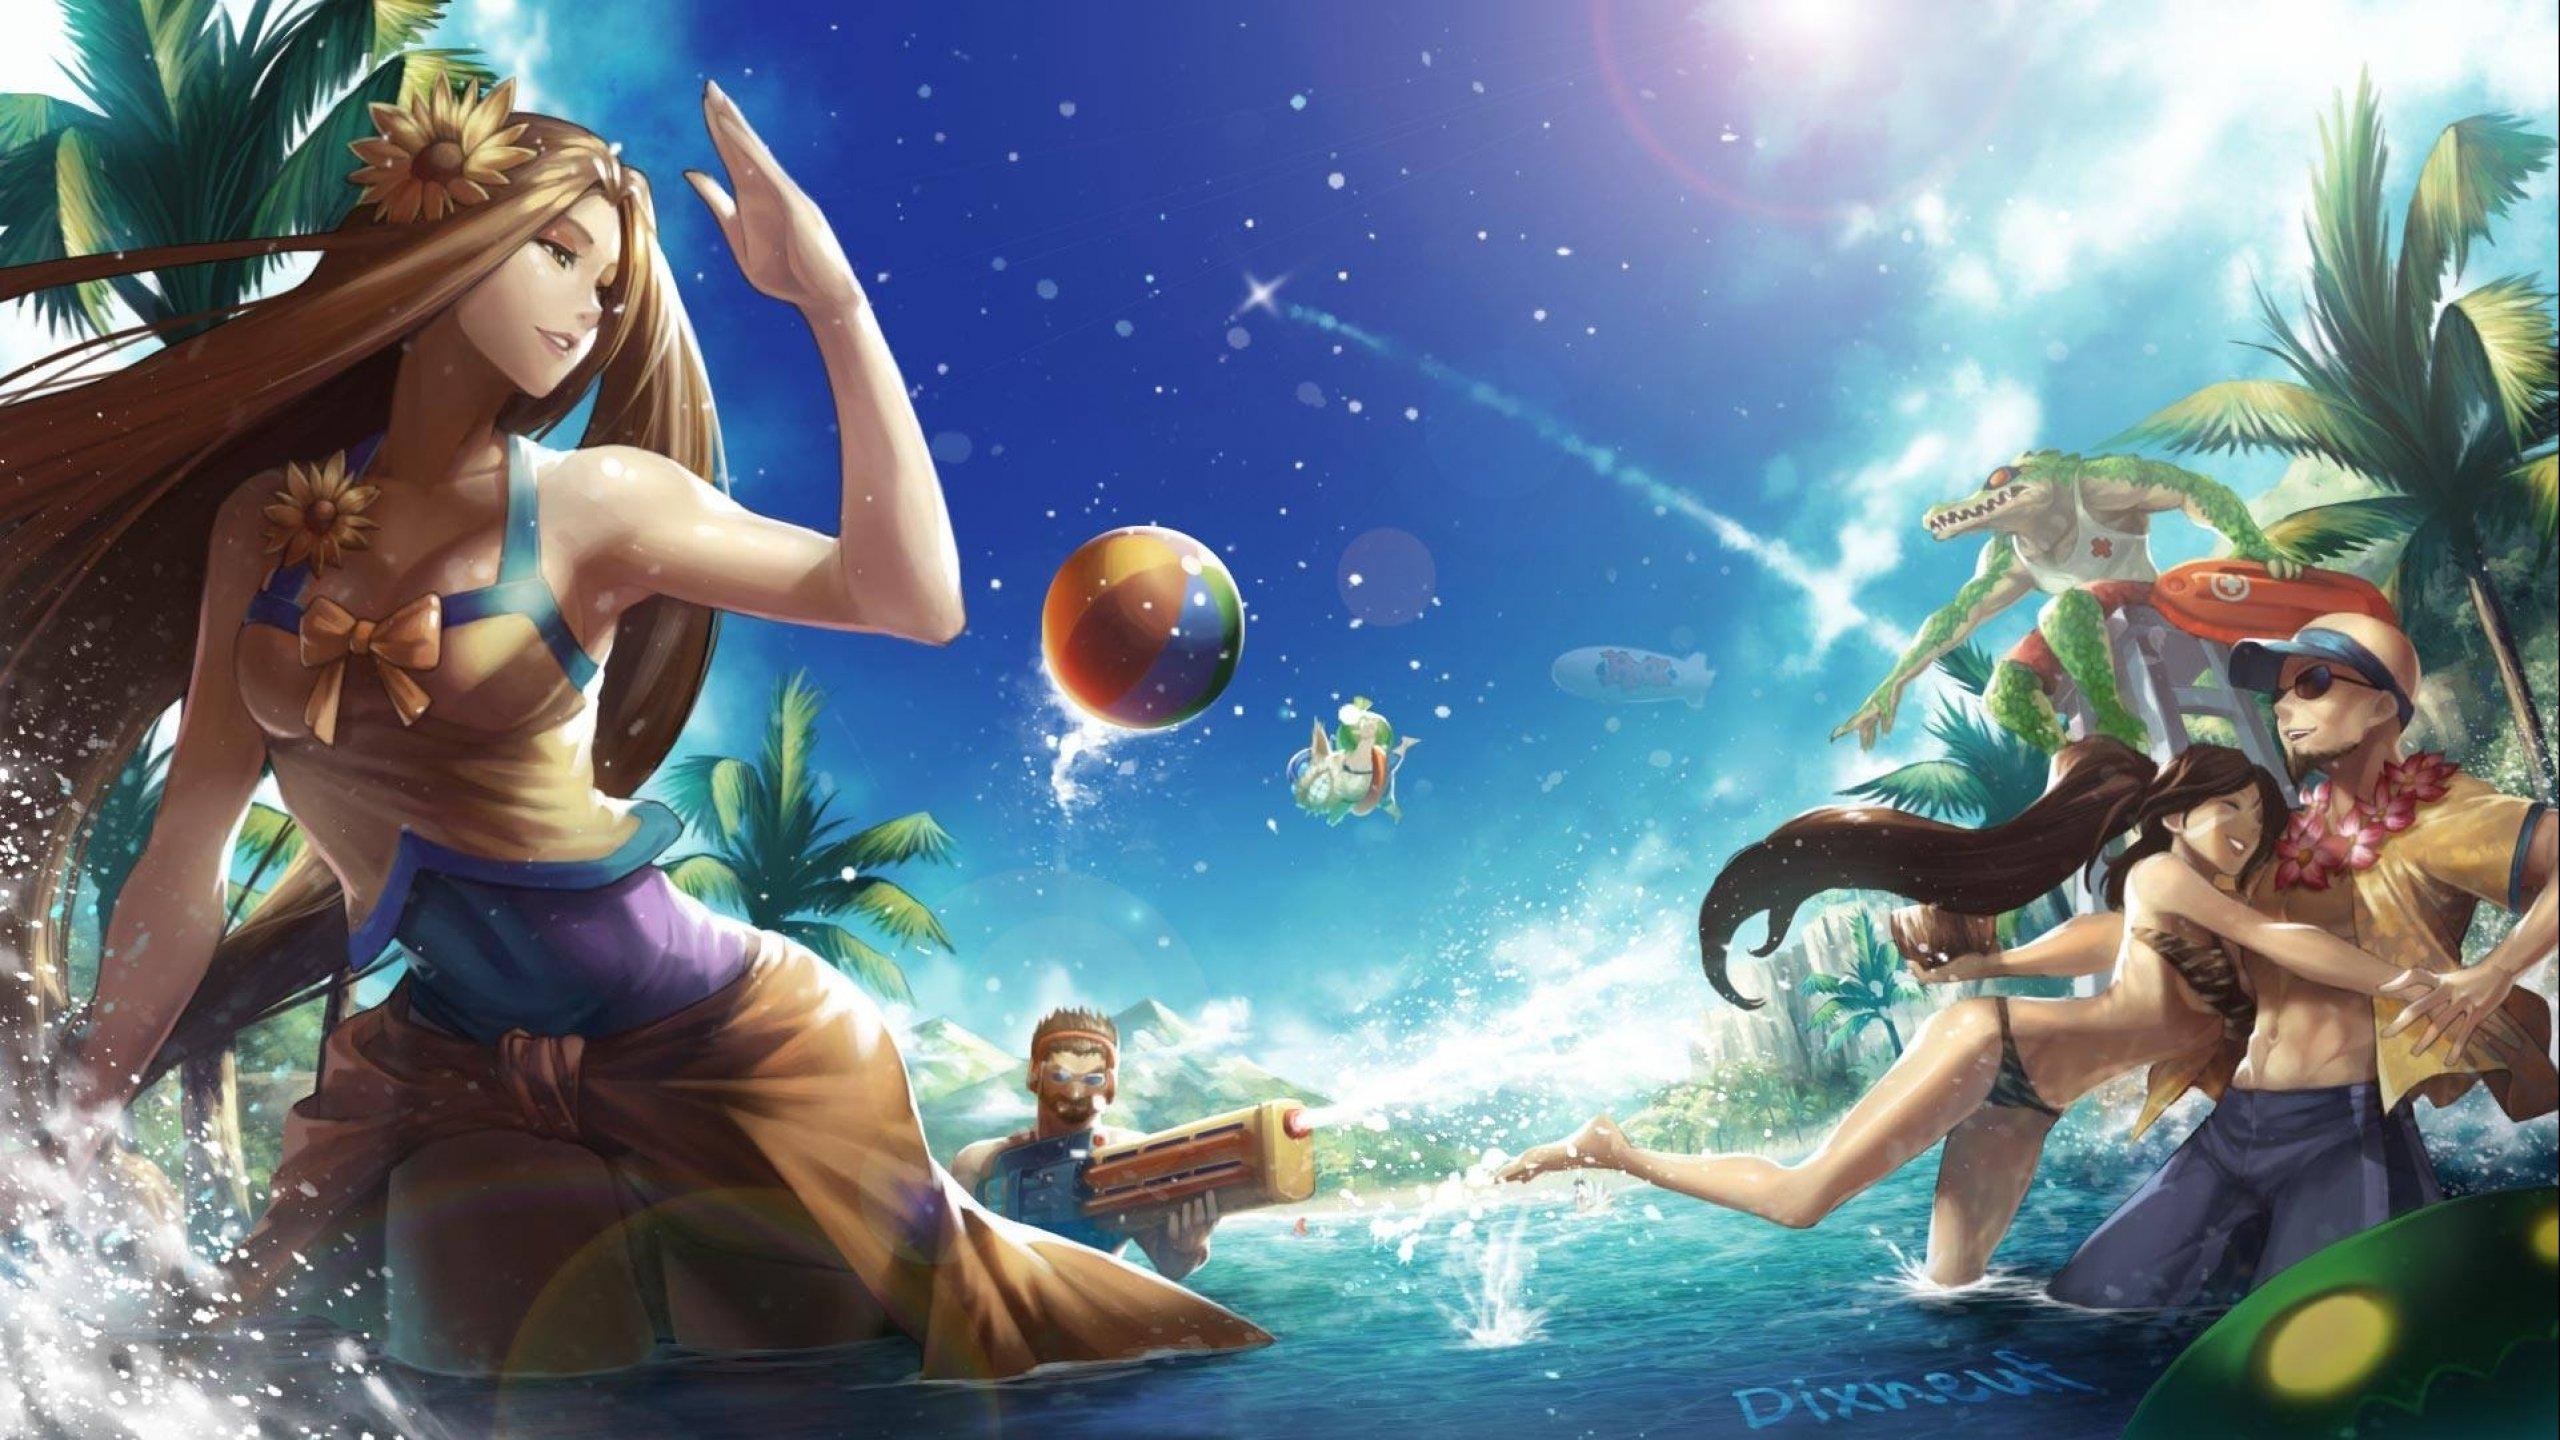 Dixneufs Artworks   League of Legends Wallpapers 2560x1440